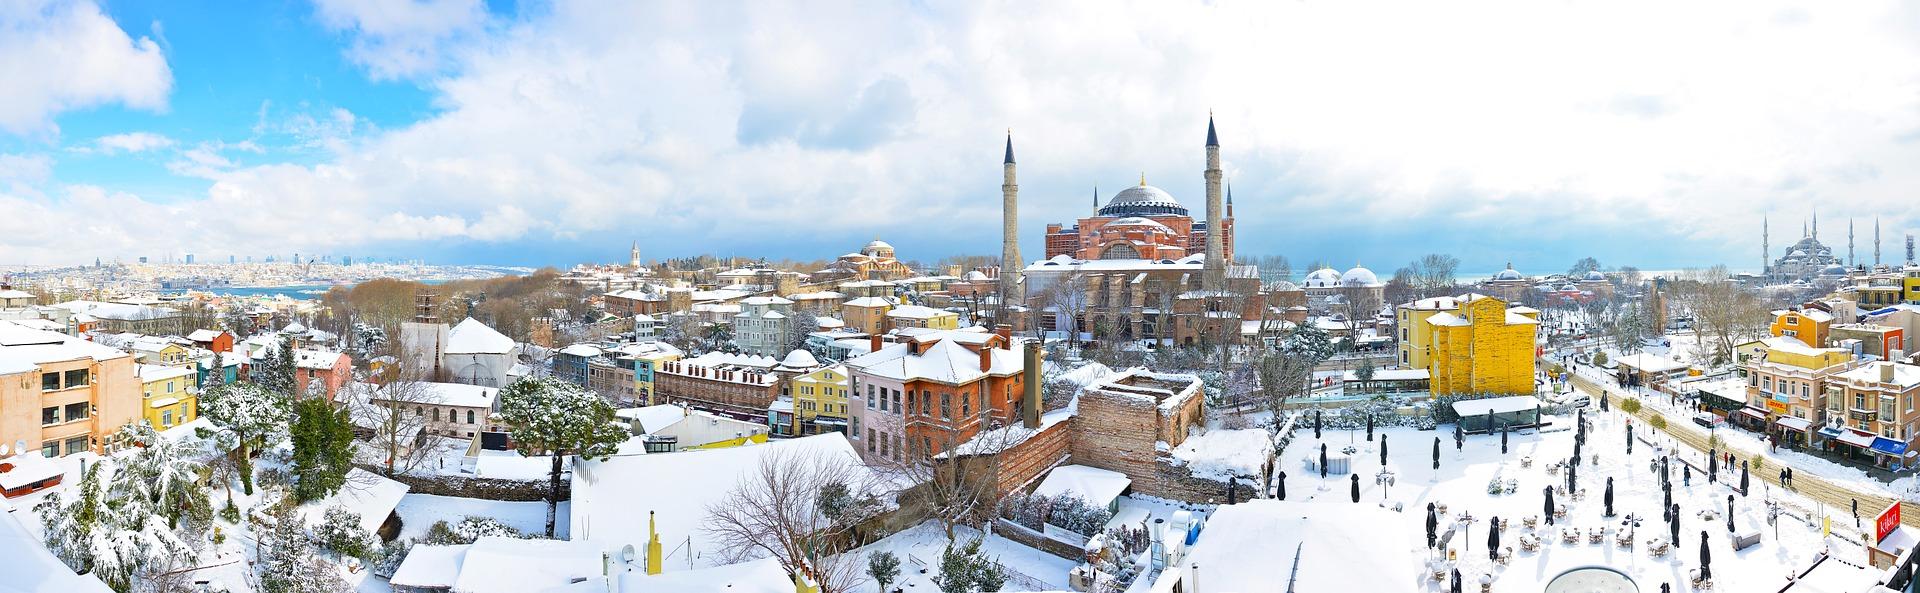 istanbul-908599_1920